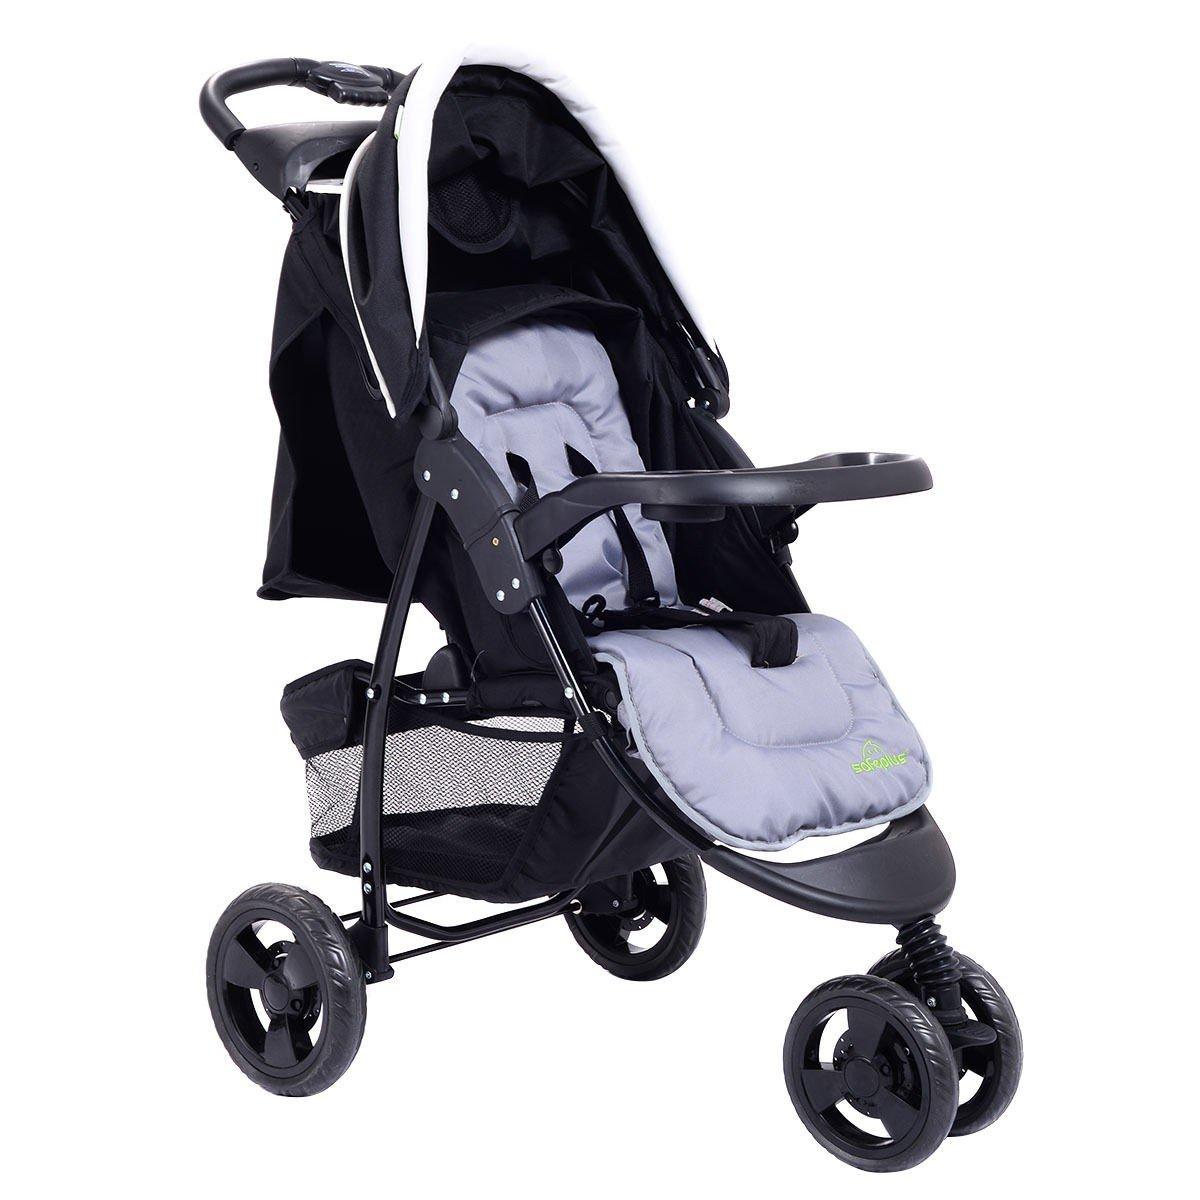 MD Group Baby Stroller 3- Wheel Balck Foldable Iron Adjustable Multi-position Backrests Kids Travel